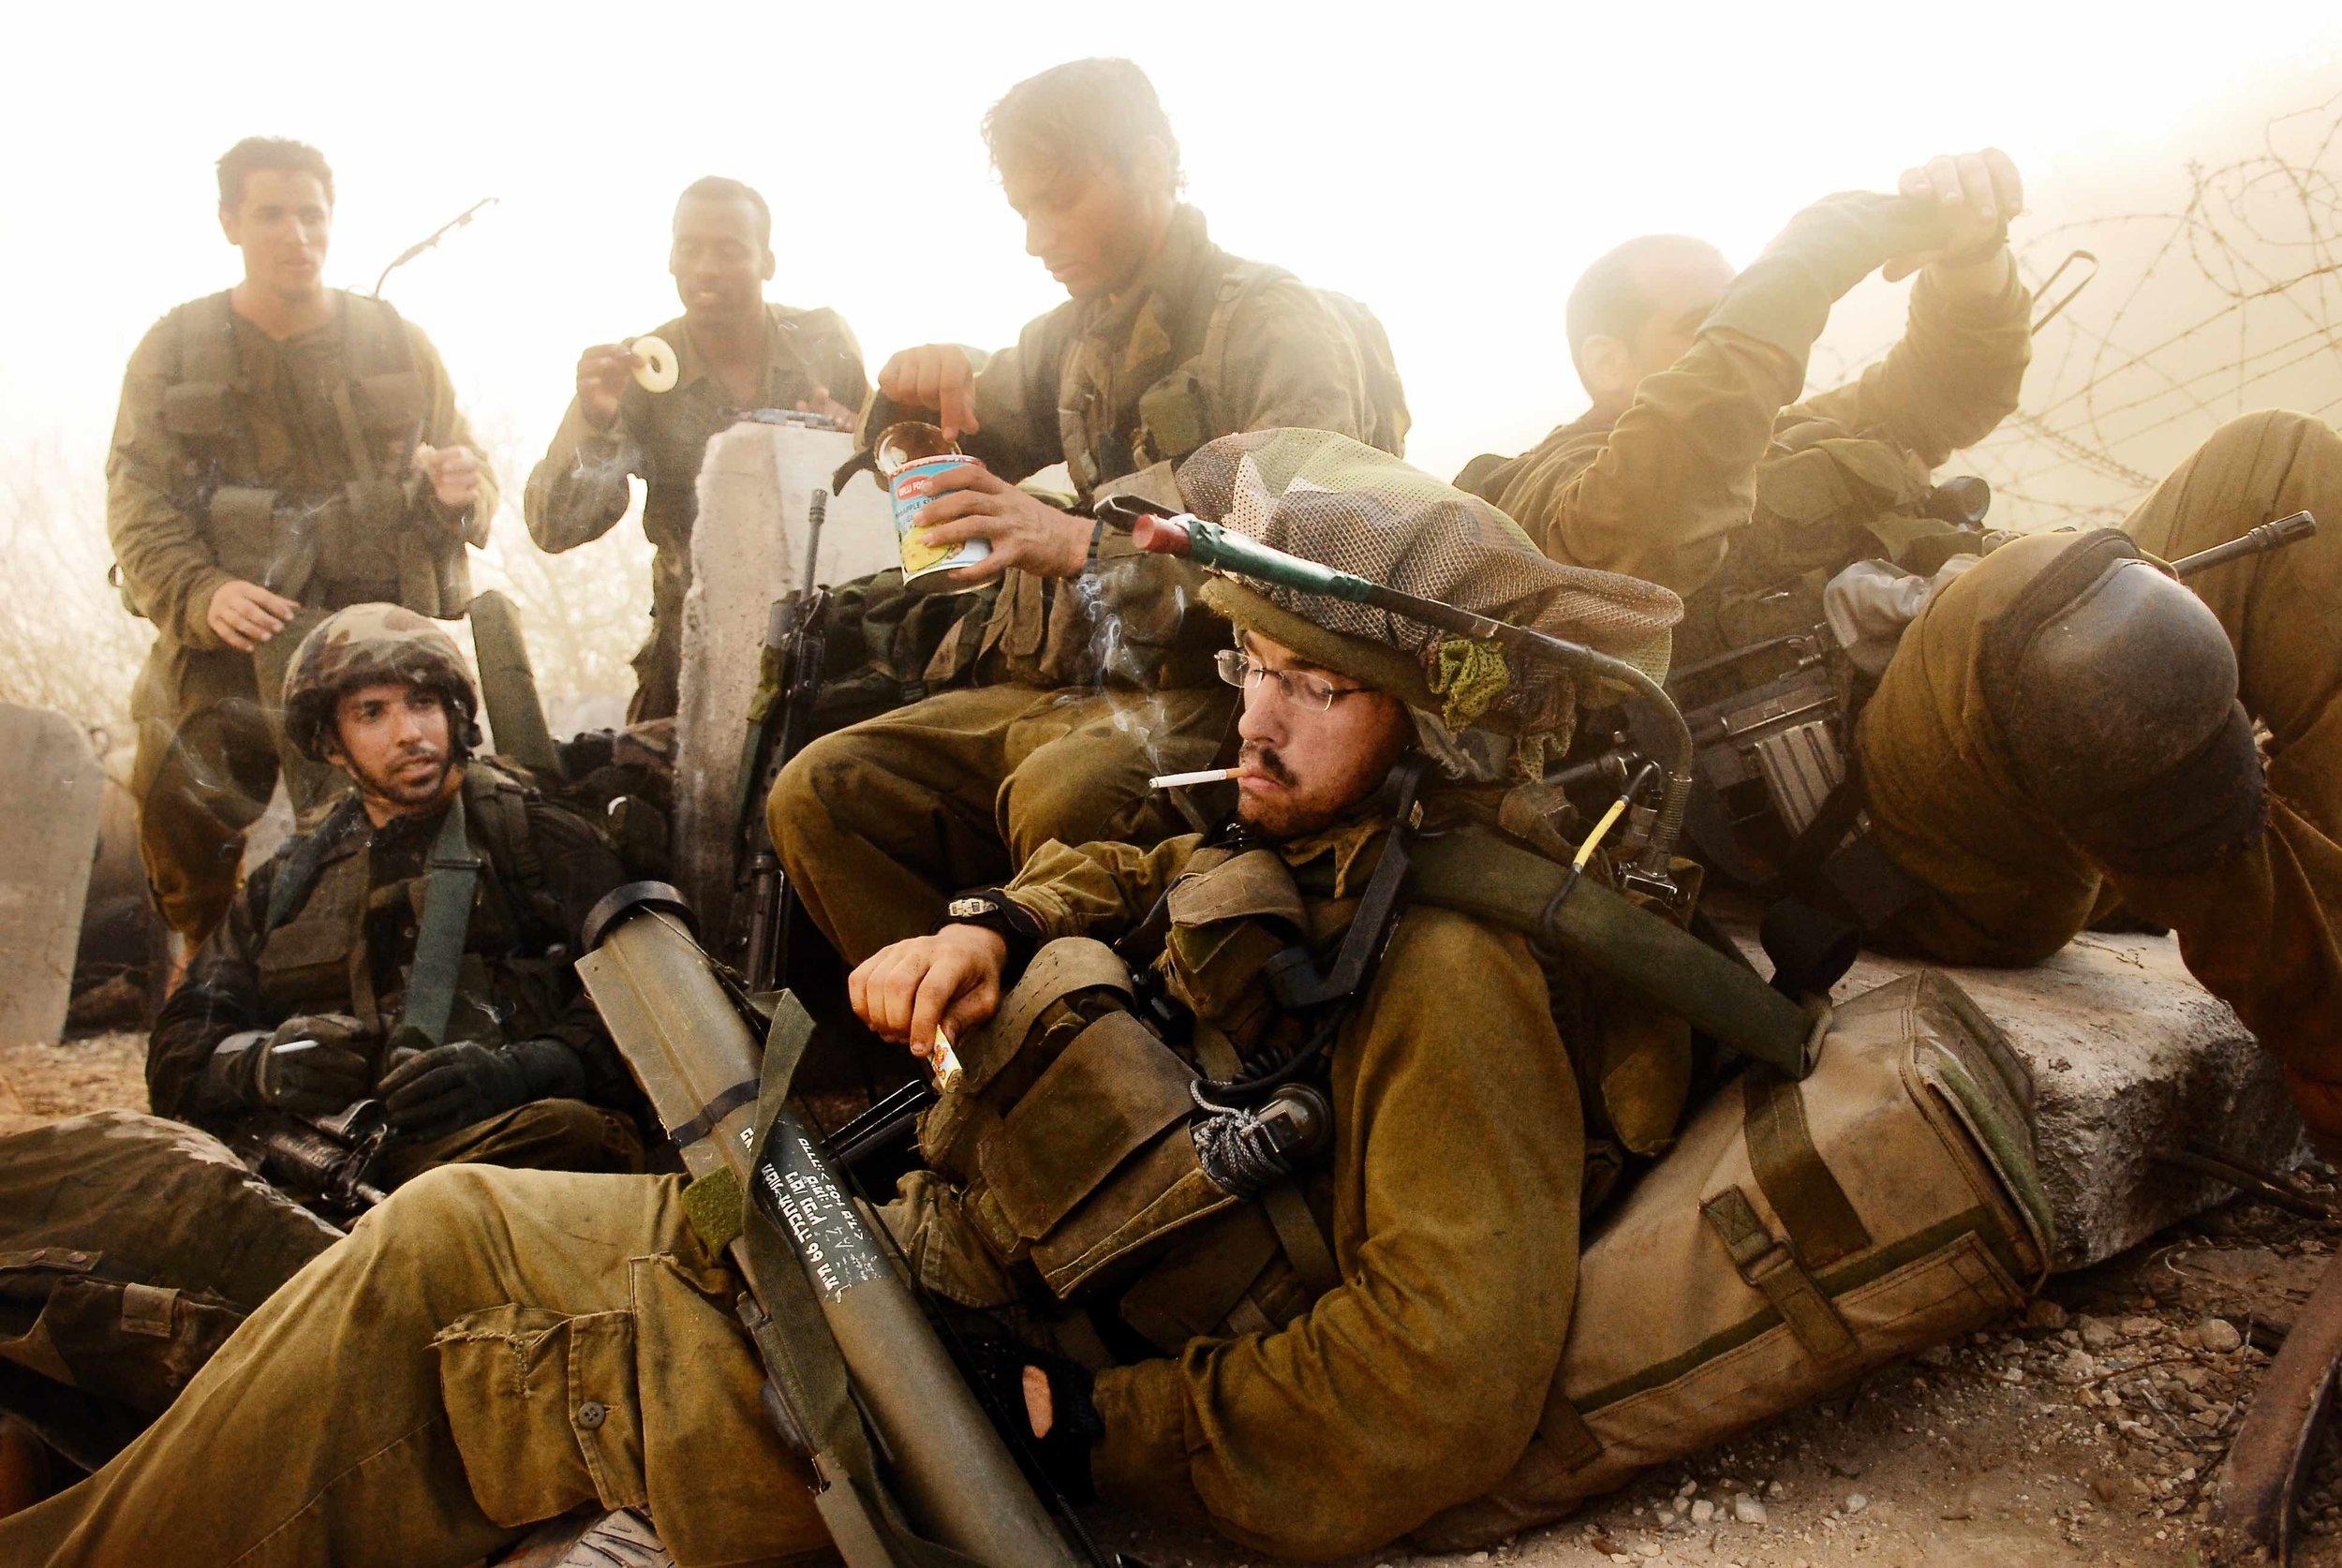 Israeli Soldiers / Golan Heights 2006